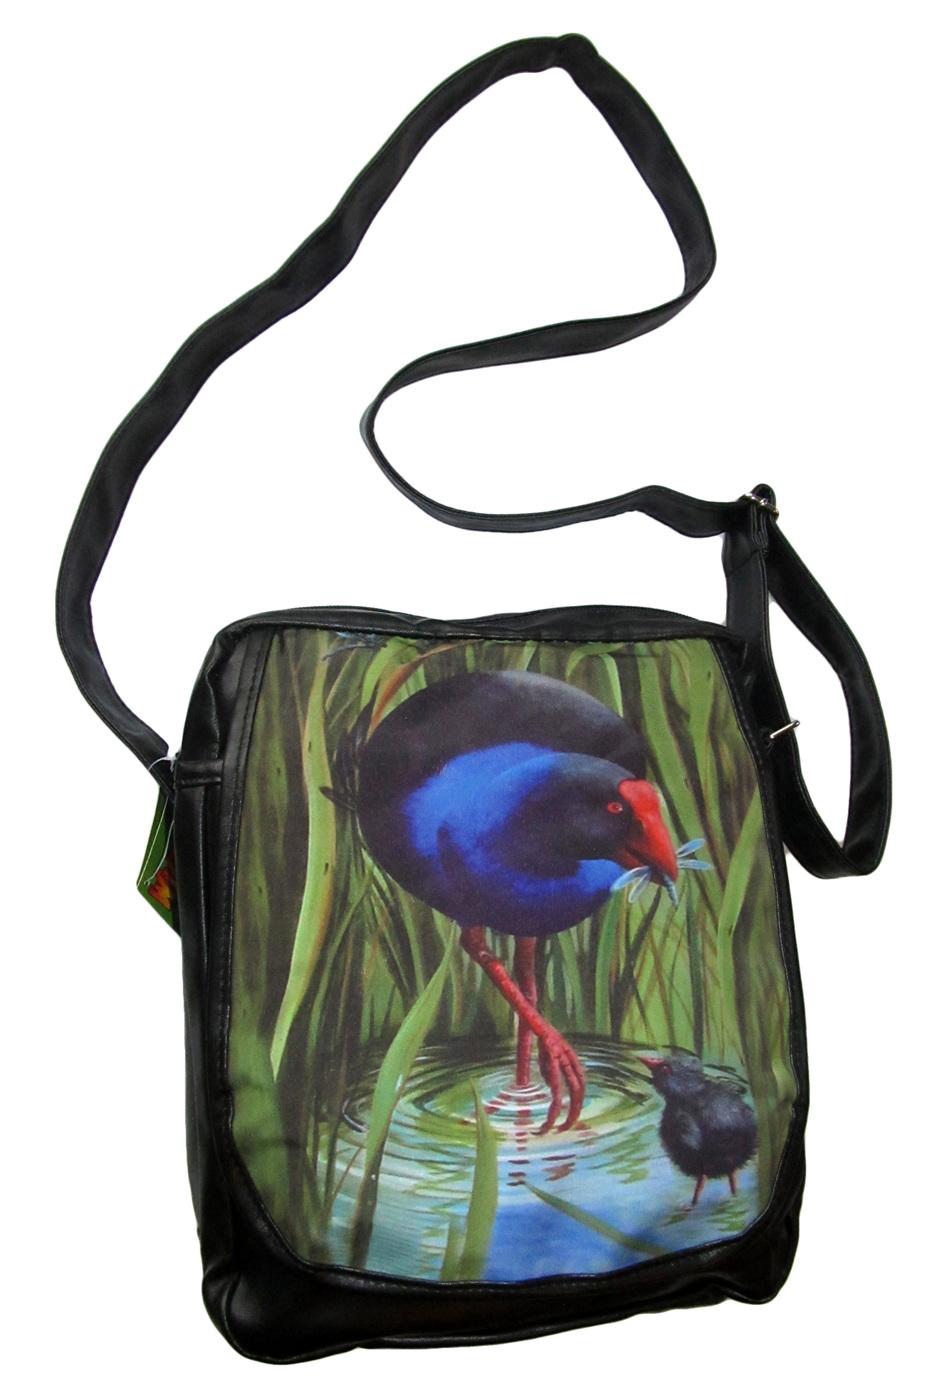 SB09 Shoulder Bag Monique's Pukeko